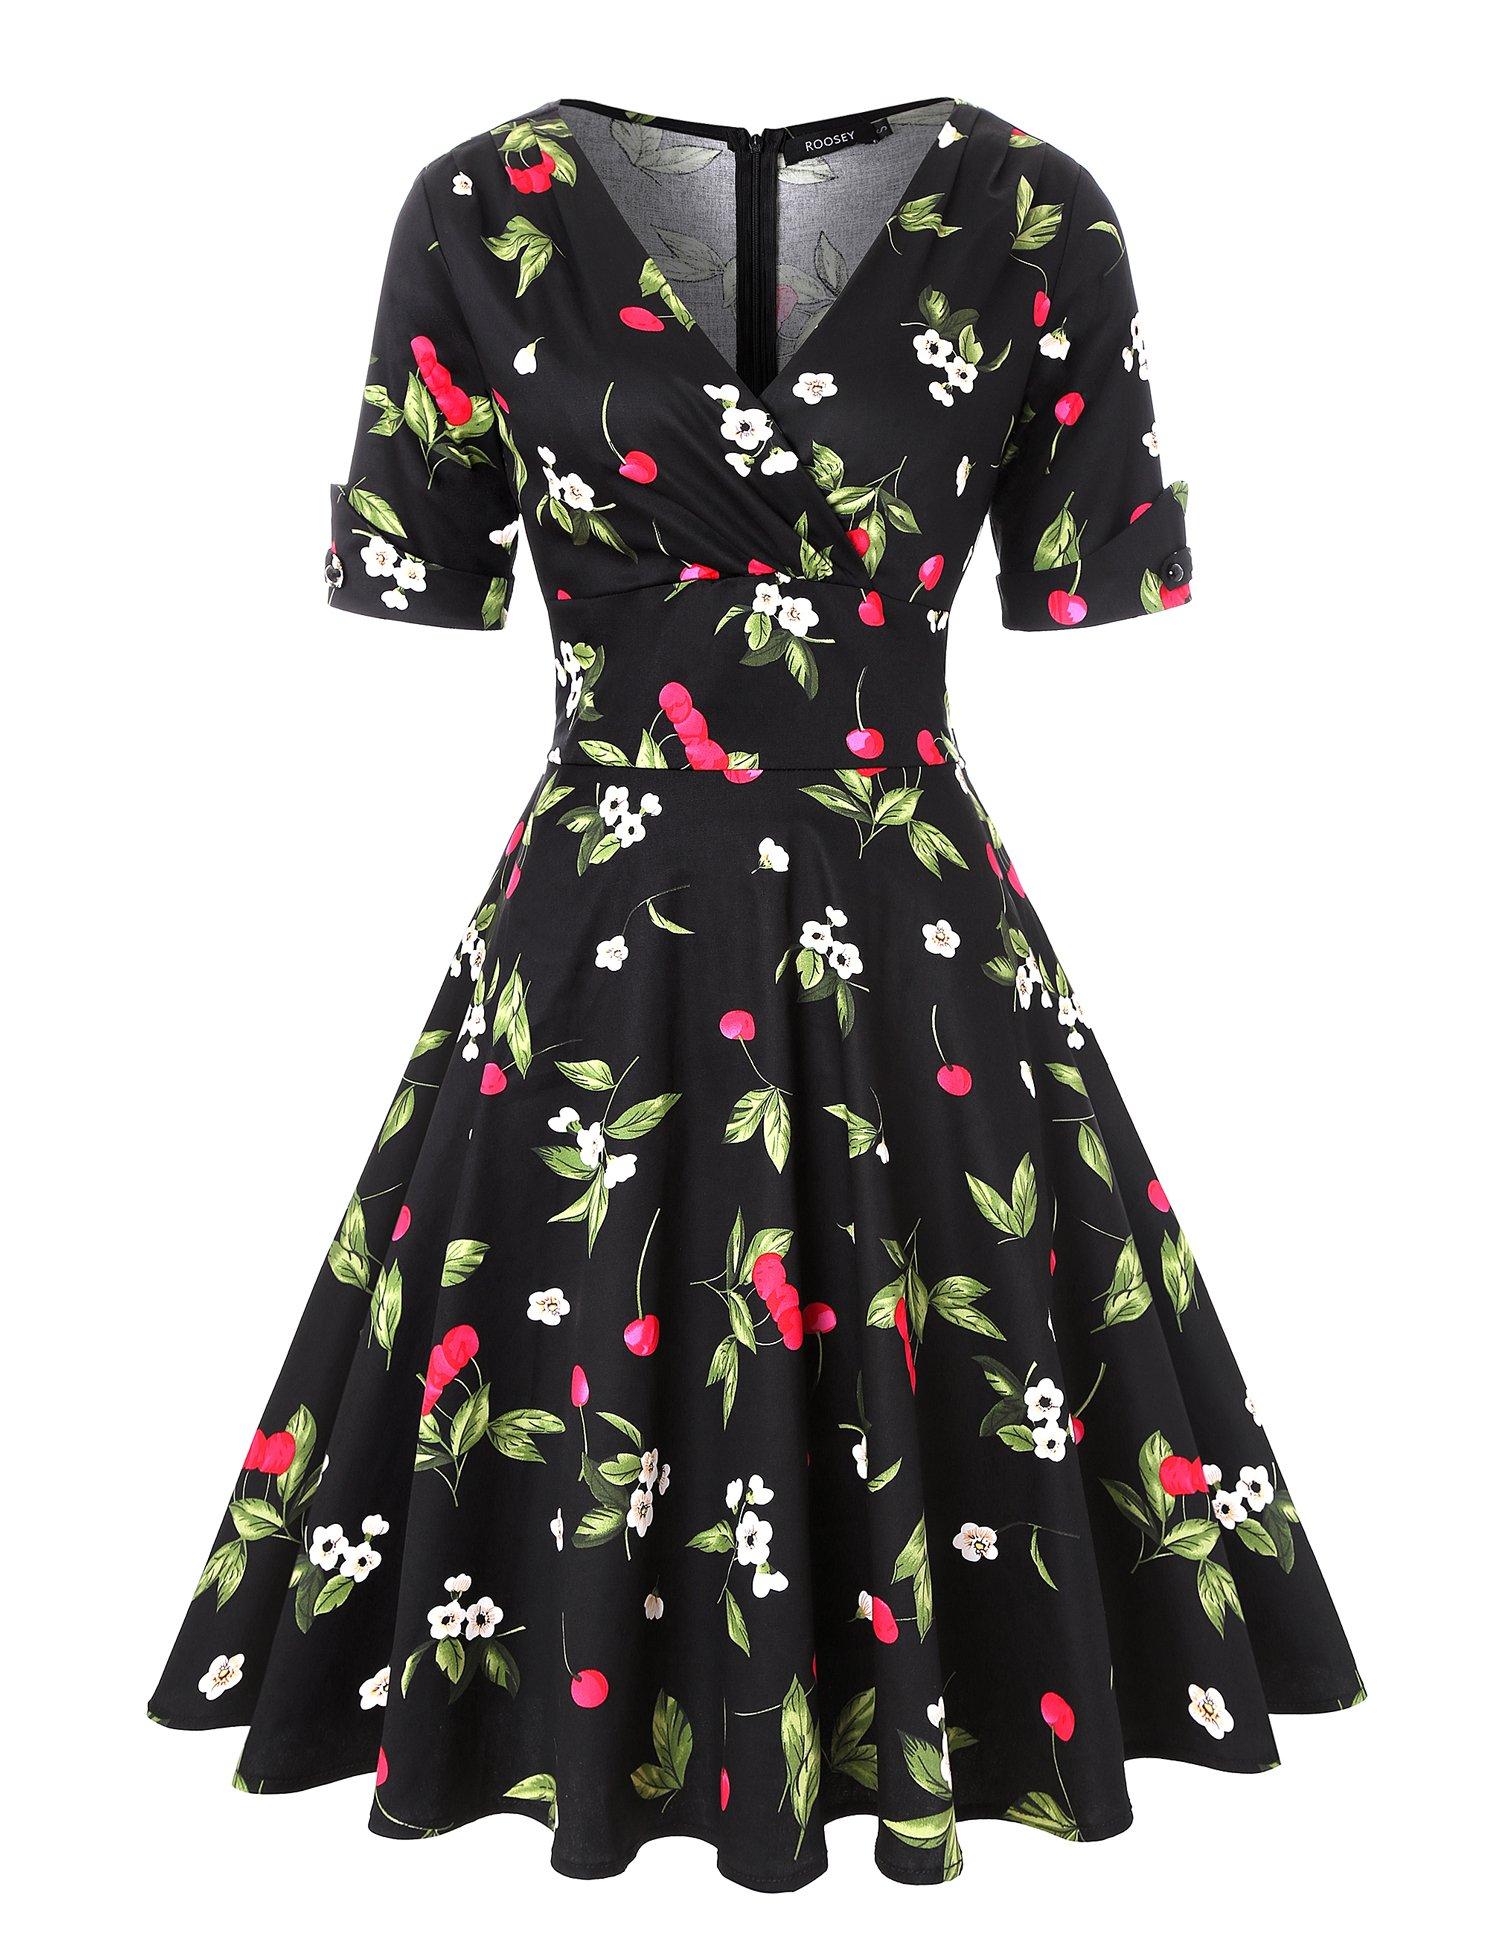 ROOSEY 1950s Vintage Retro V Neck Cherry Pattern Cocktail Prom Dress Women